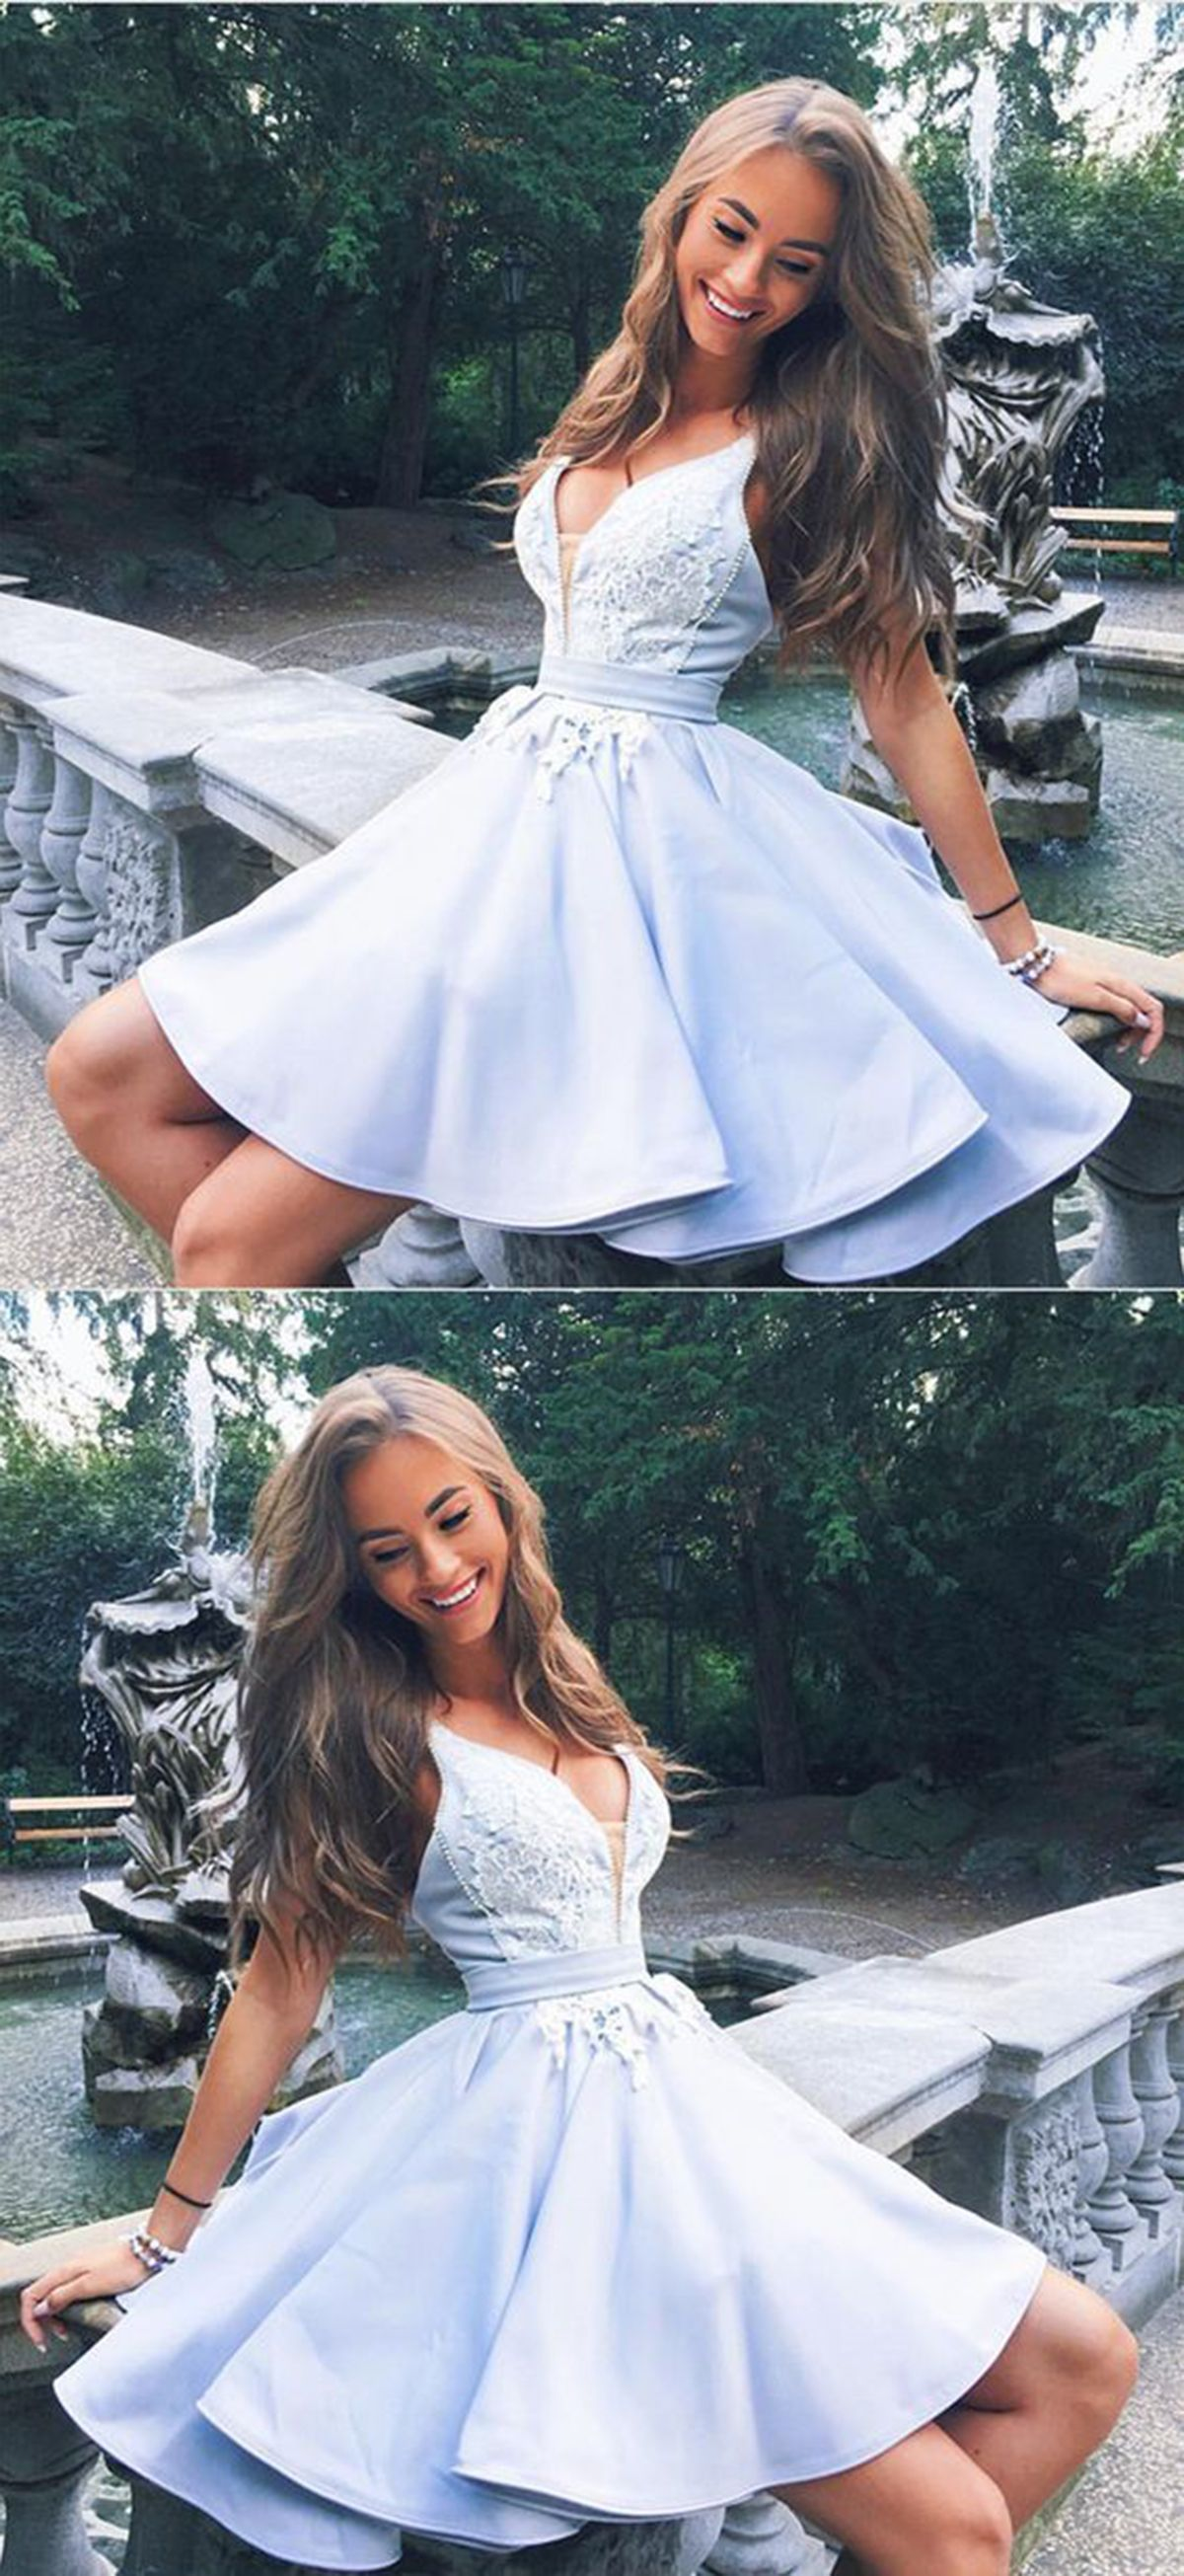 Graduation Prom Dress A V Neck Ice Blue Satin Short Prom Dress For Teens Prom Dress Homecomin Satin Homecoming Dress Hoco Dresses Homecoming Dresses Short [ 2610 x 1200 Pixel ]